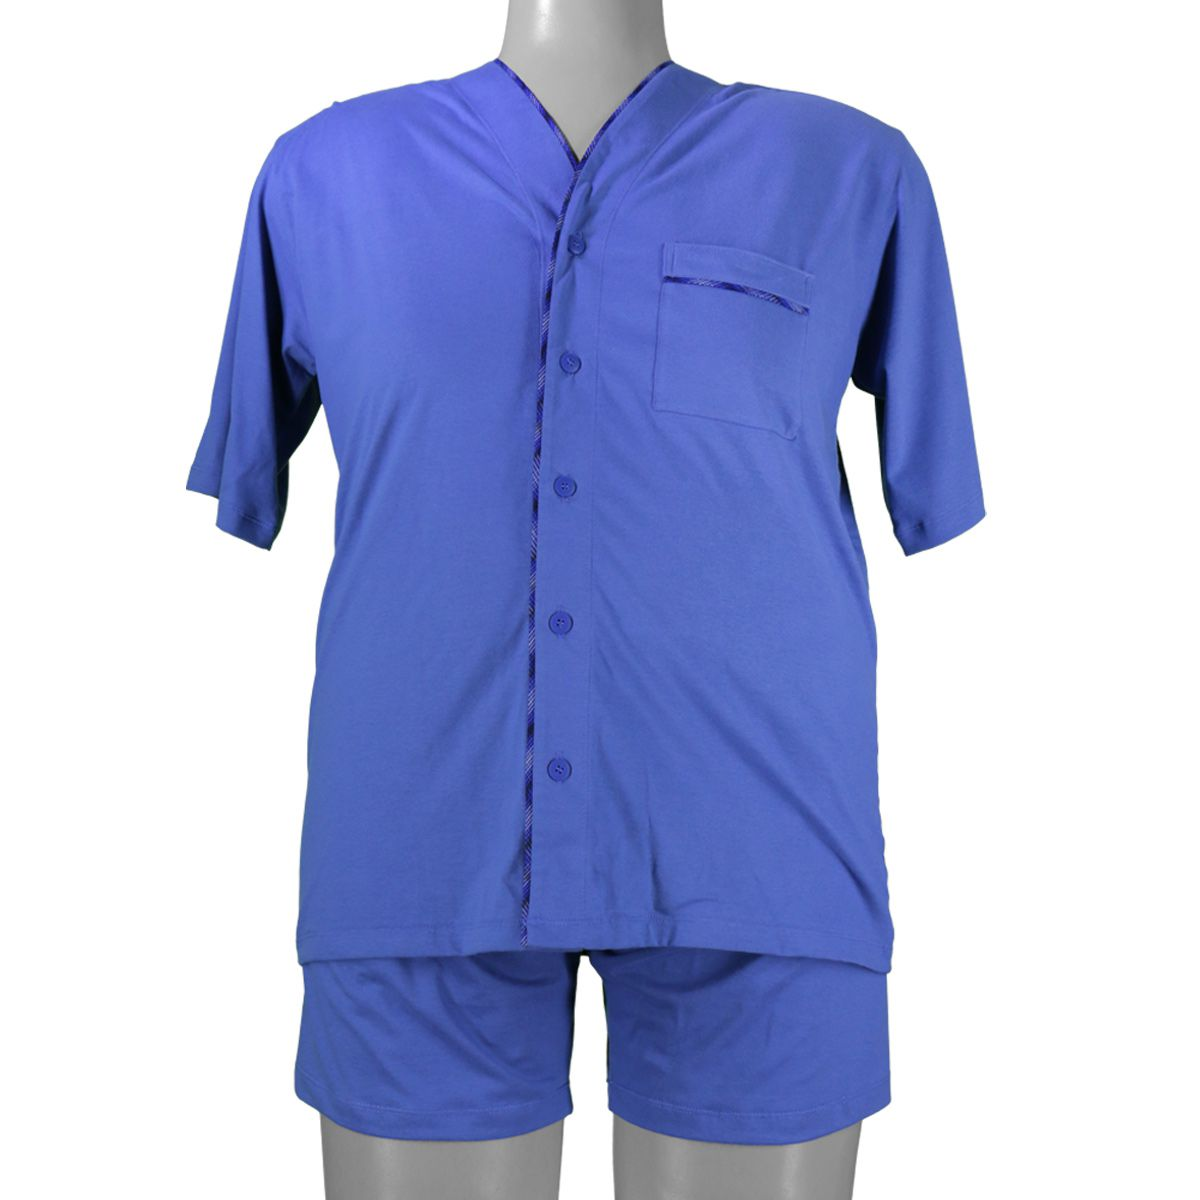 Pijama Curto Aberto Candisani Tamanhos EG1 a EG6 - 518